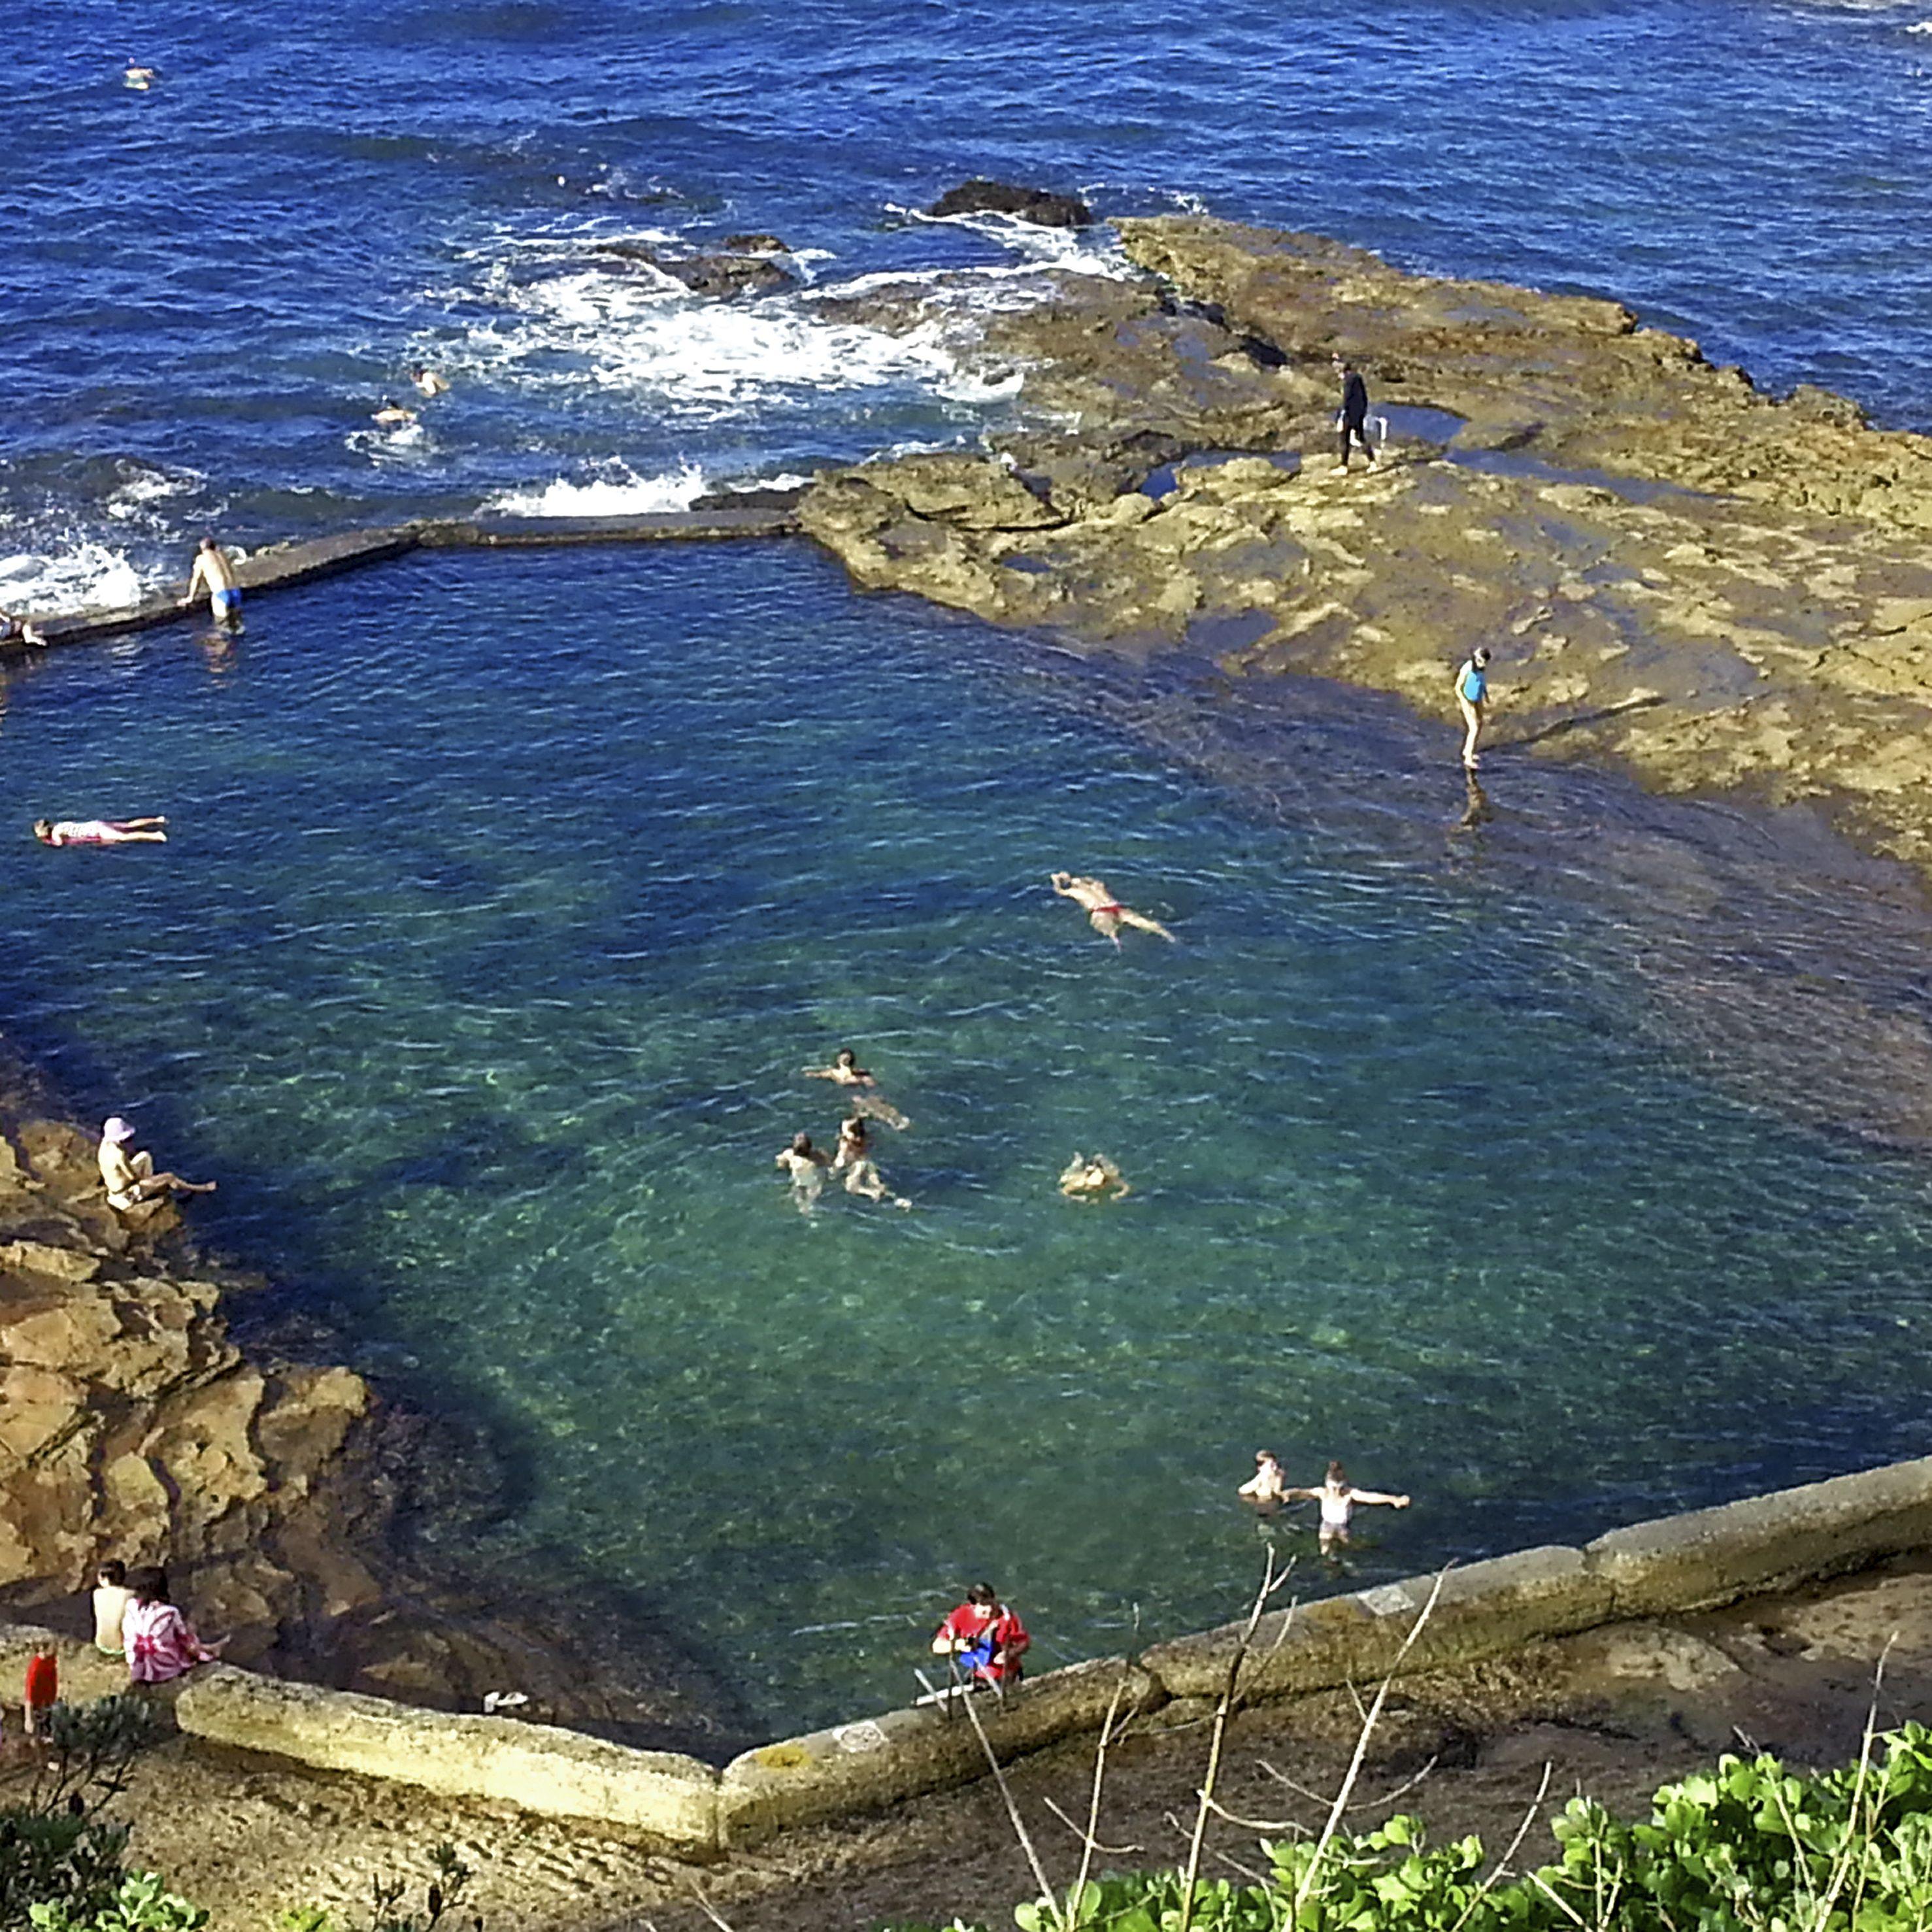 Photo Comp Visions Of Illawarra Treasures Wollongong Rock Pools Night Swimming